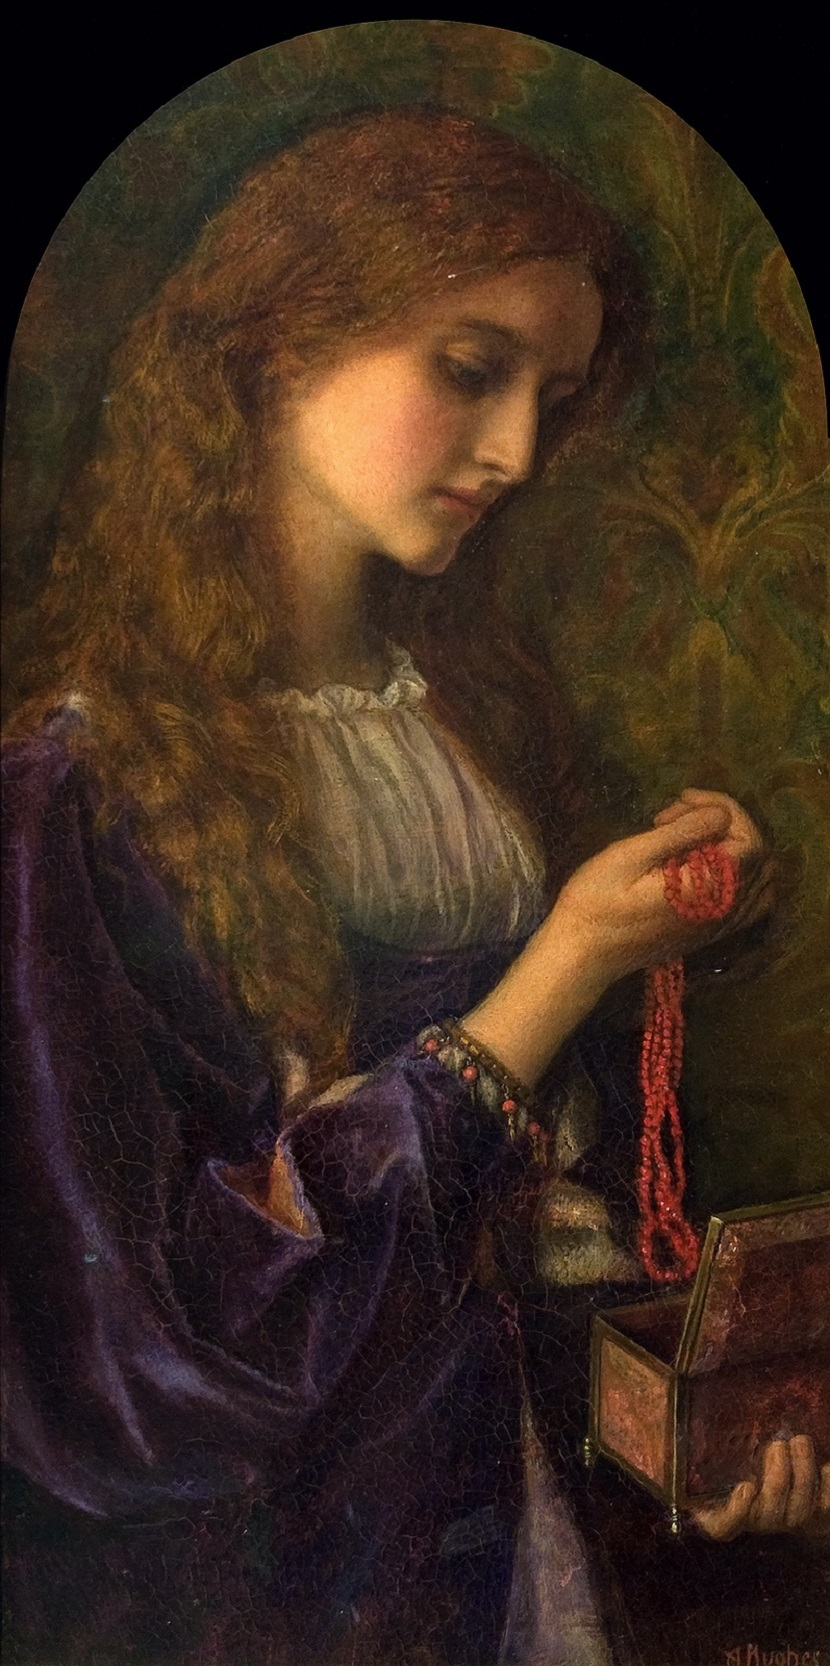 1862-1865 Магдалина (Madeleine) Камбрия, Карлайл, Дом-музей Тулли и картинная галерея.